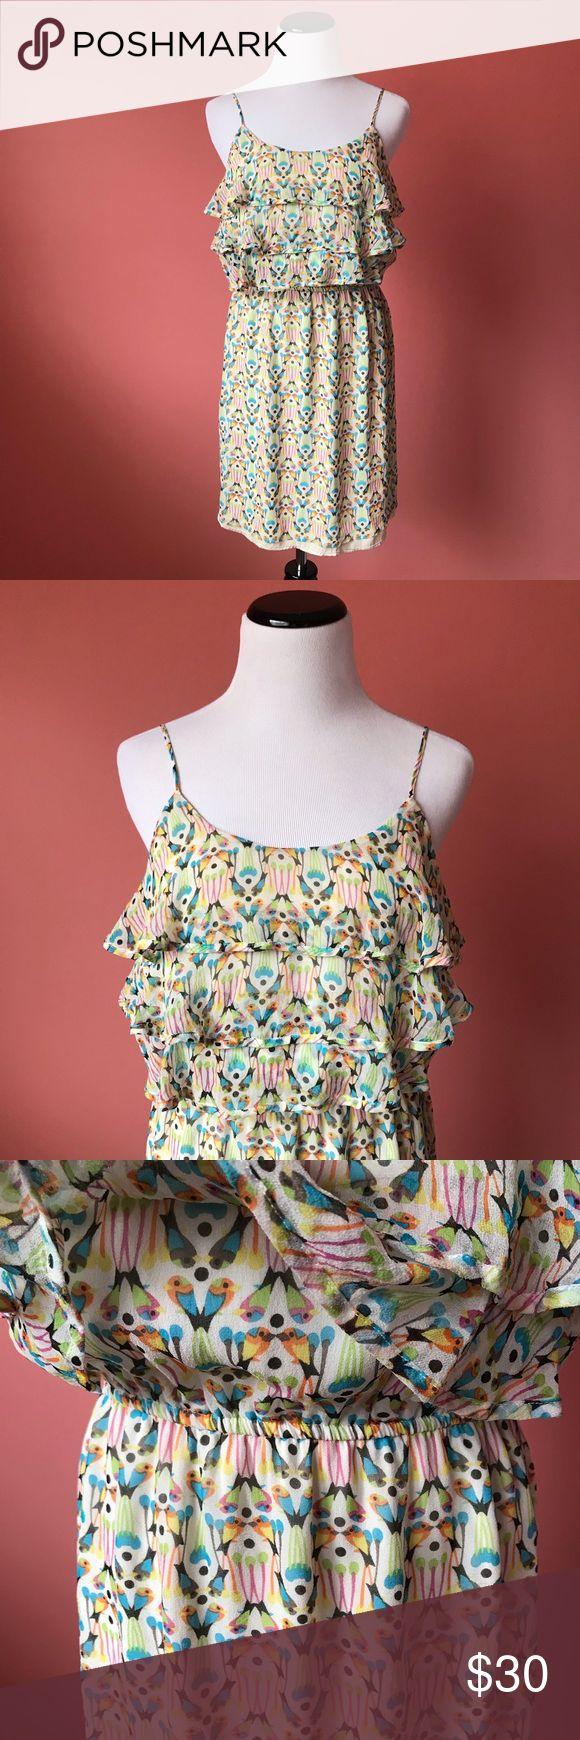 (Charlie Jade) dress. Size SP.Excellent condition! Charlie Jade dress. Size SP. Adjustable straps. Lined. Excellent condition! Charlie Jade Dresses